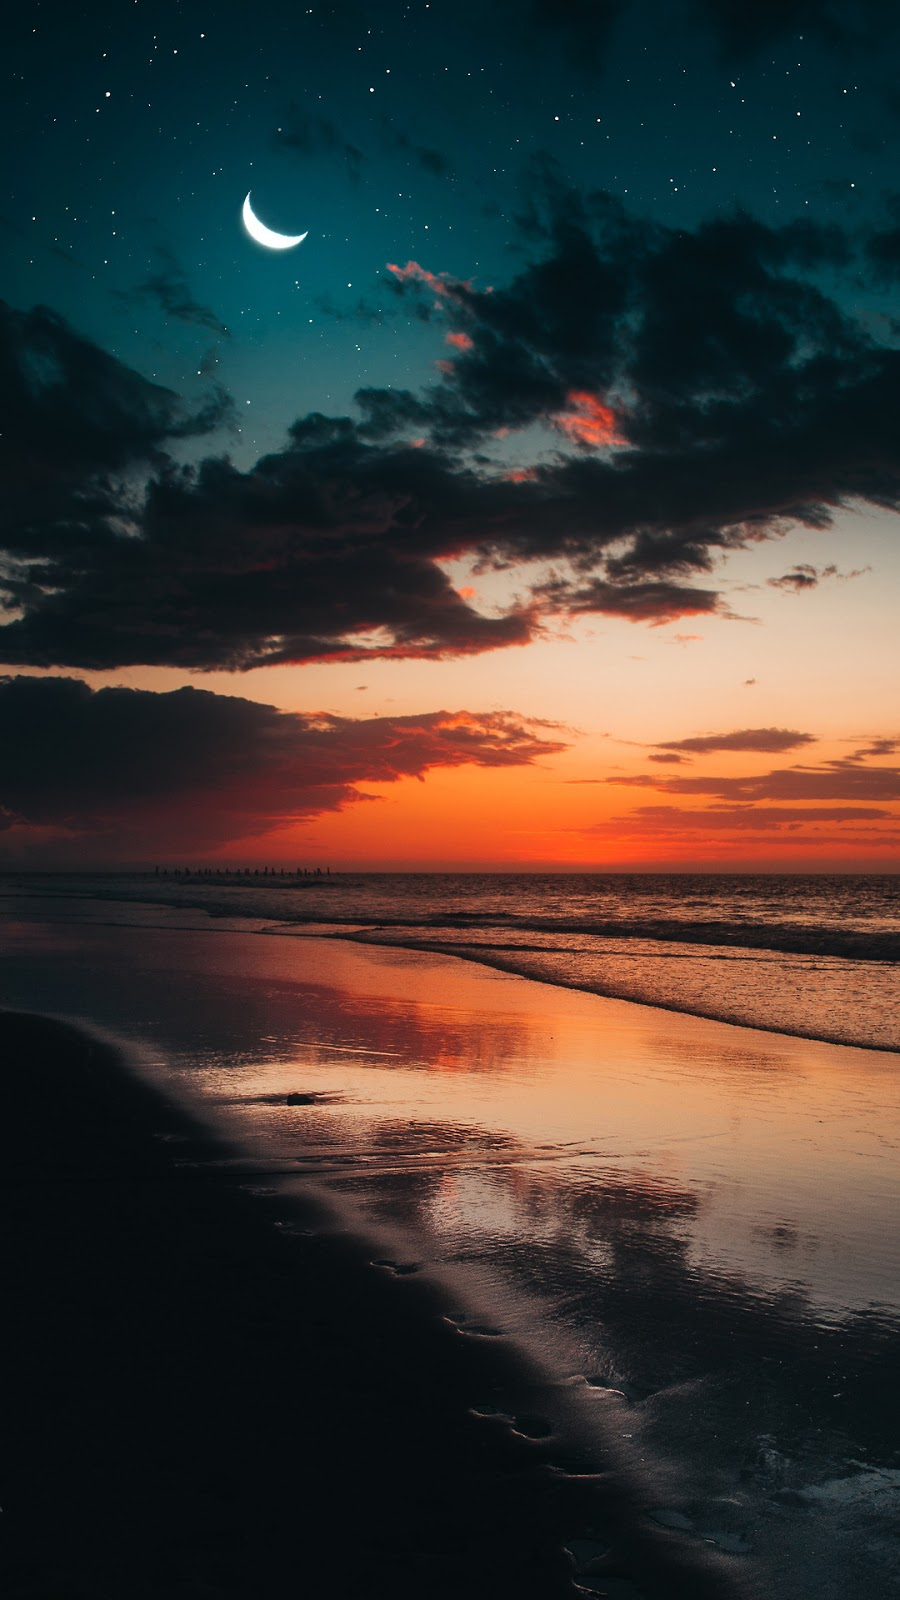 Beach in the night